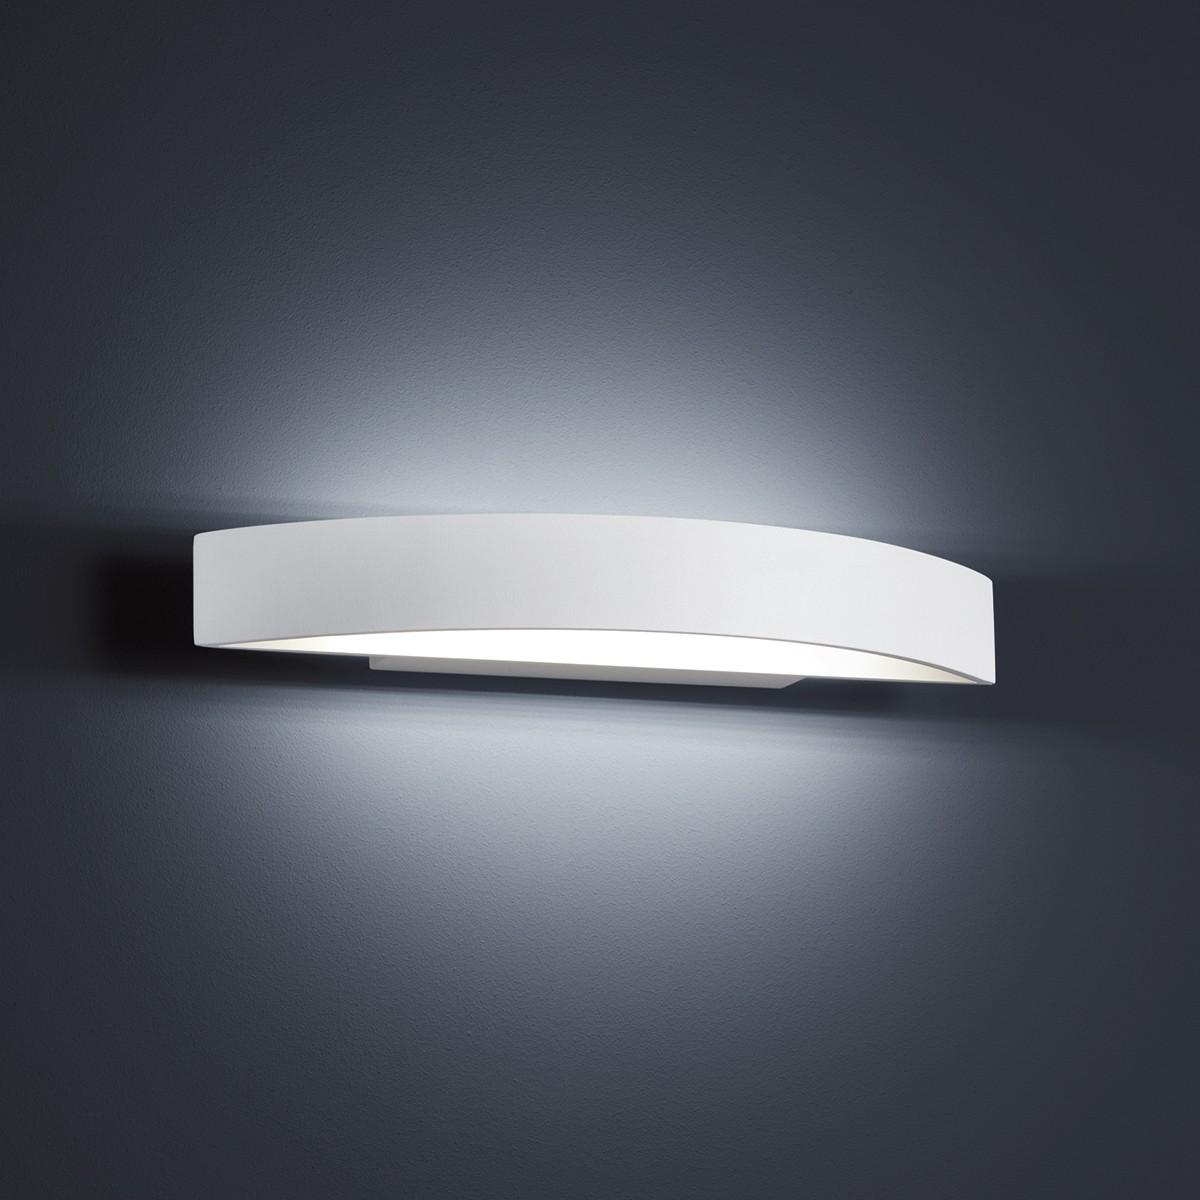 Helestra Yona Wandleuchte, Länge: 37,5 cm, weiß matt